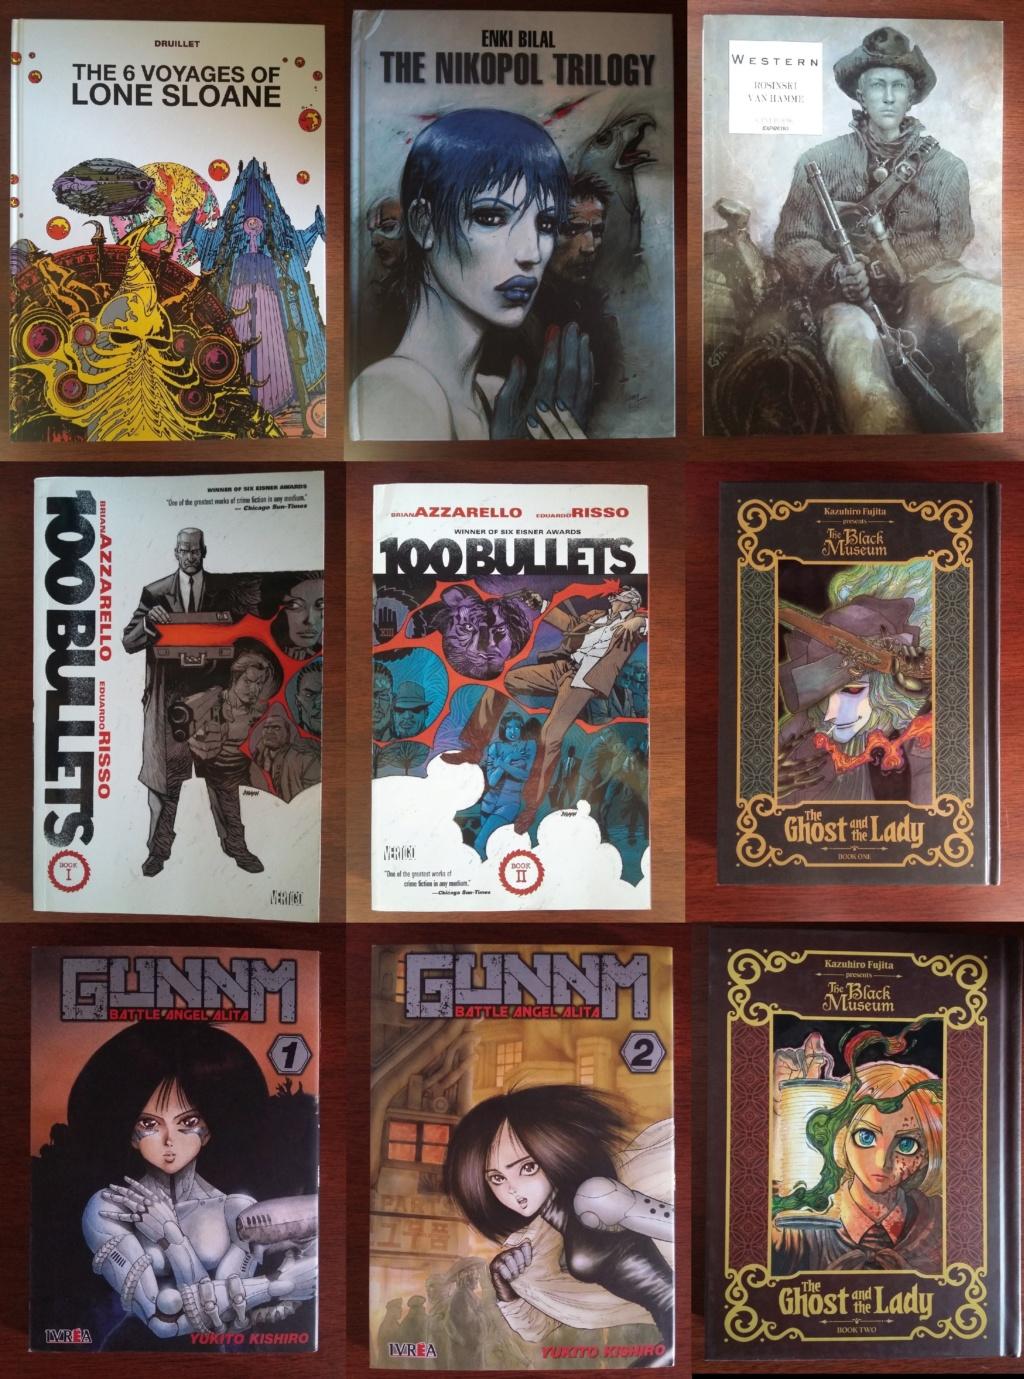 [Comics] Siguen las adquisiciones 2019 - Página 2 Xxd11